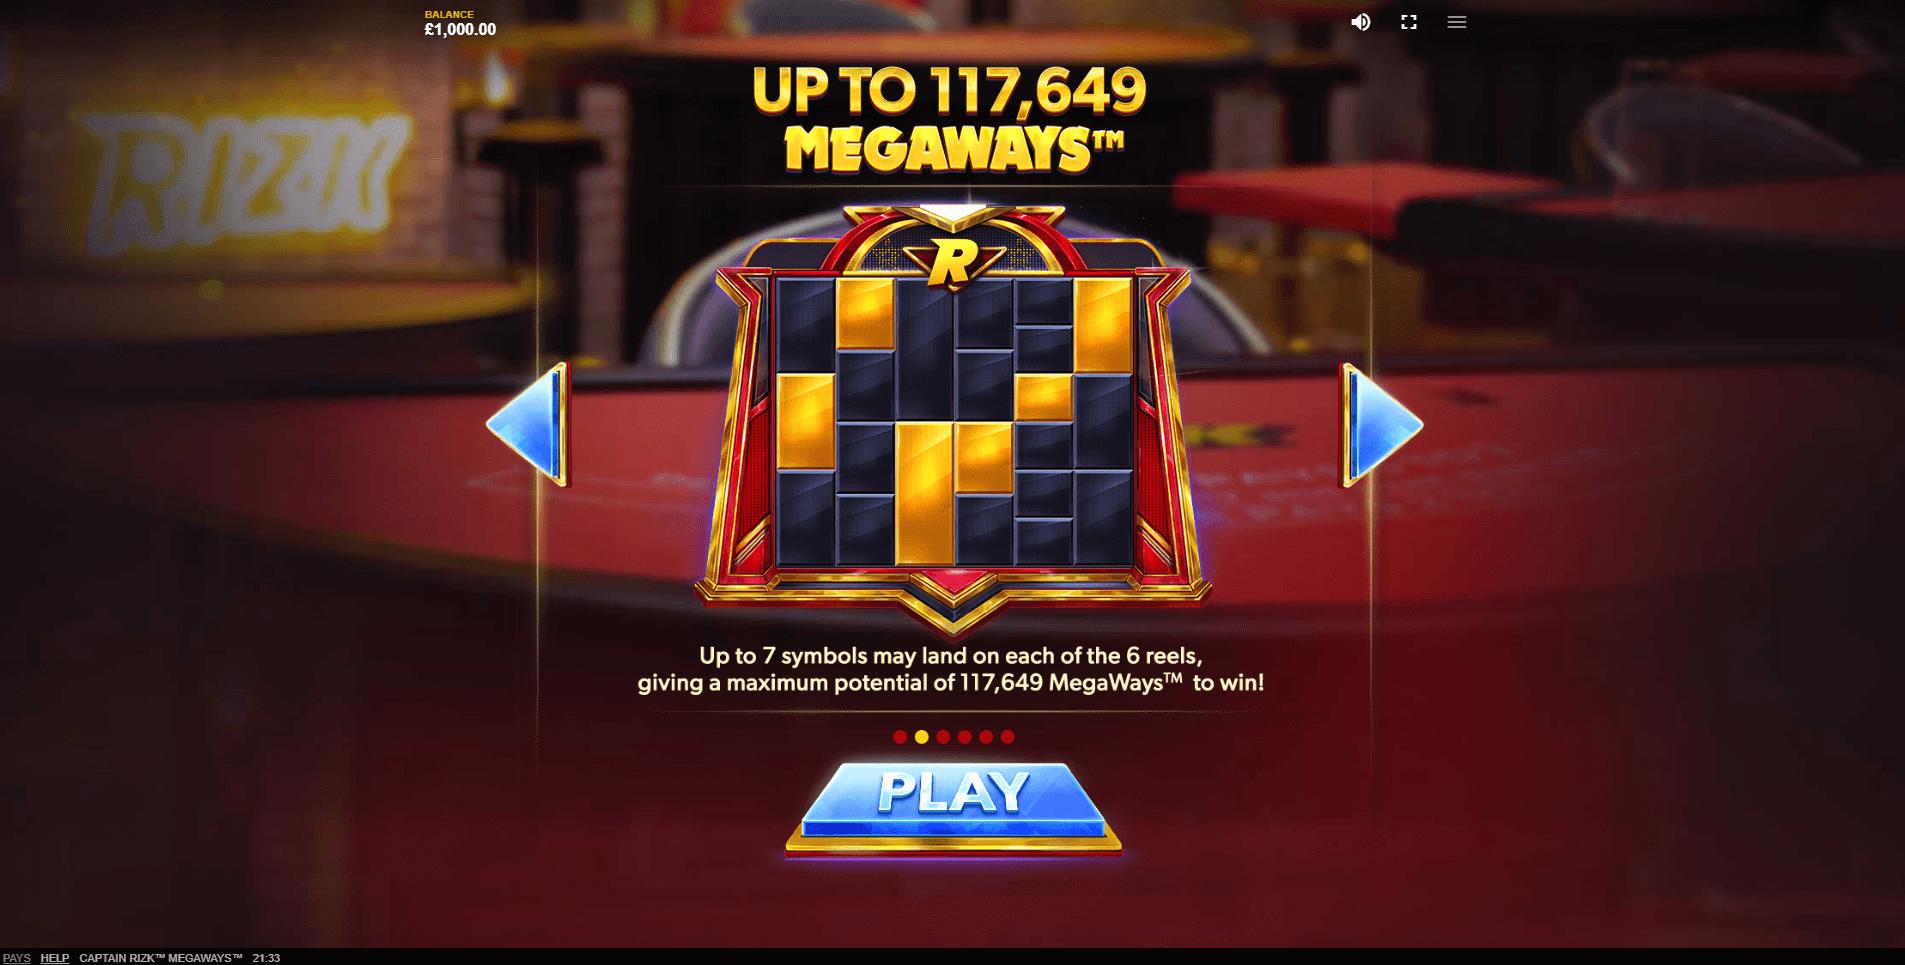 Captain Rizk Megaways Slot Machine